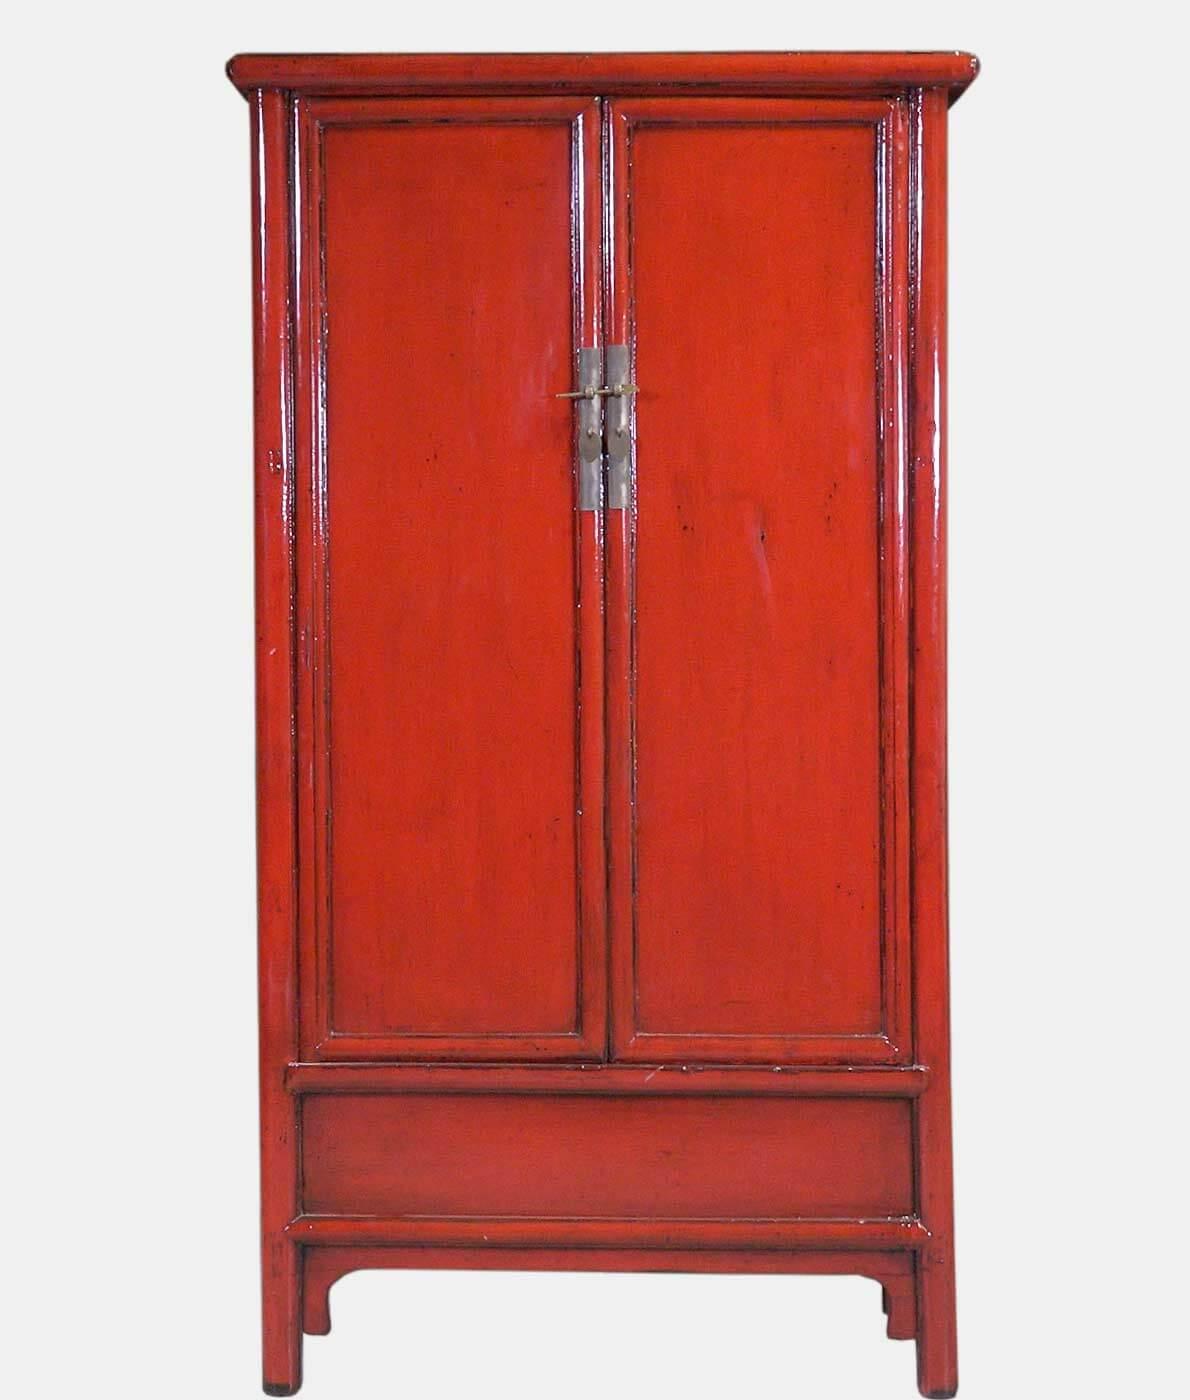 oude-chinese-kast-oosterse-meubelen-voorkant detail